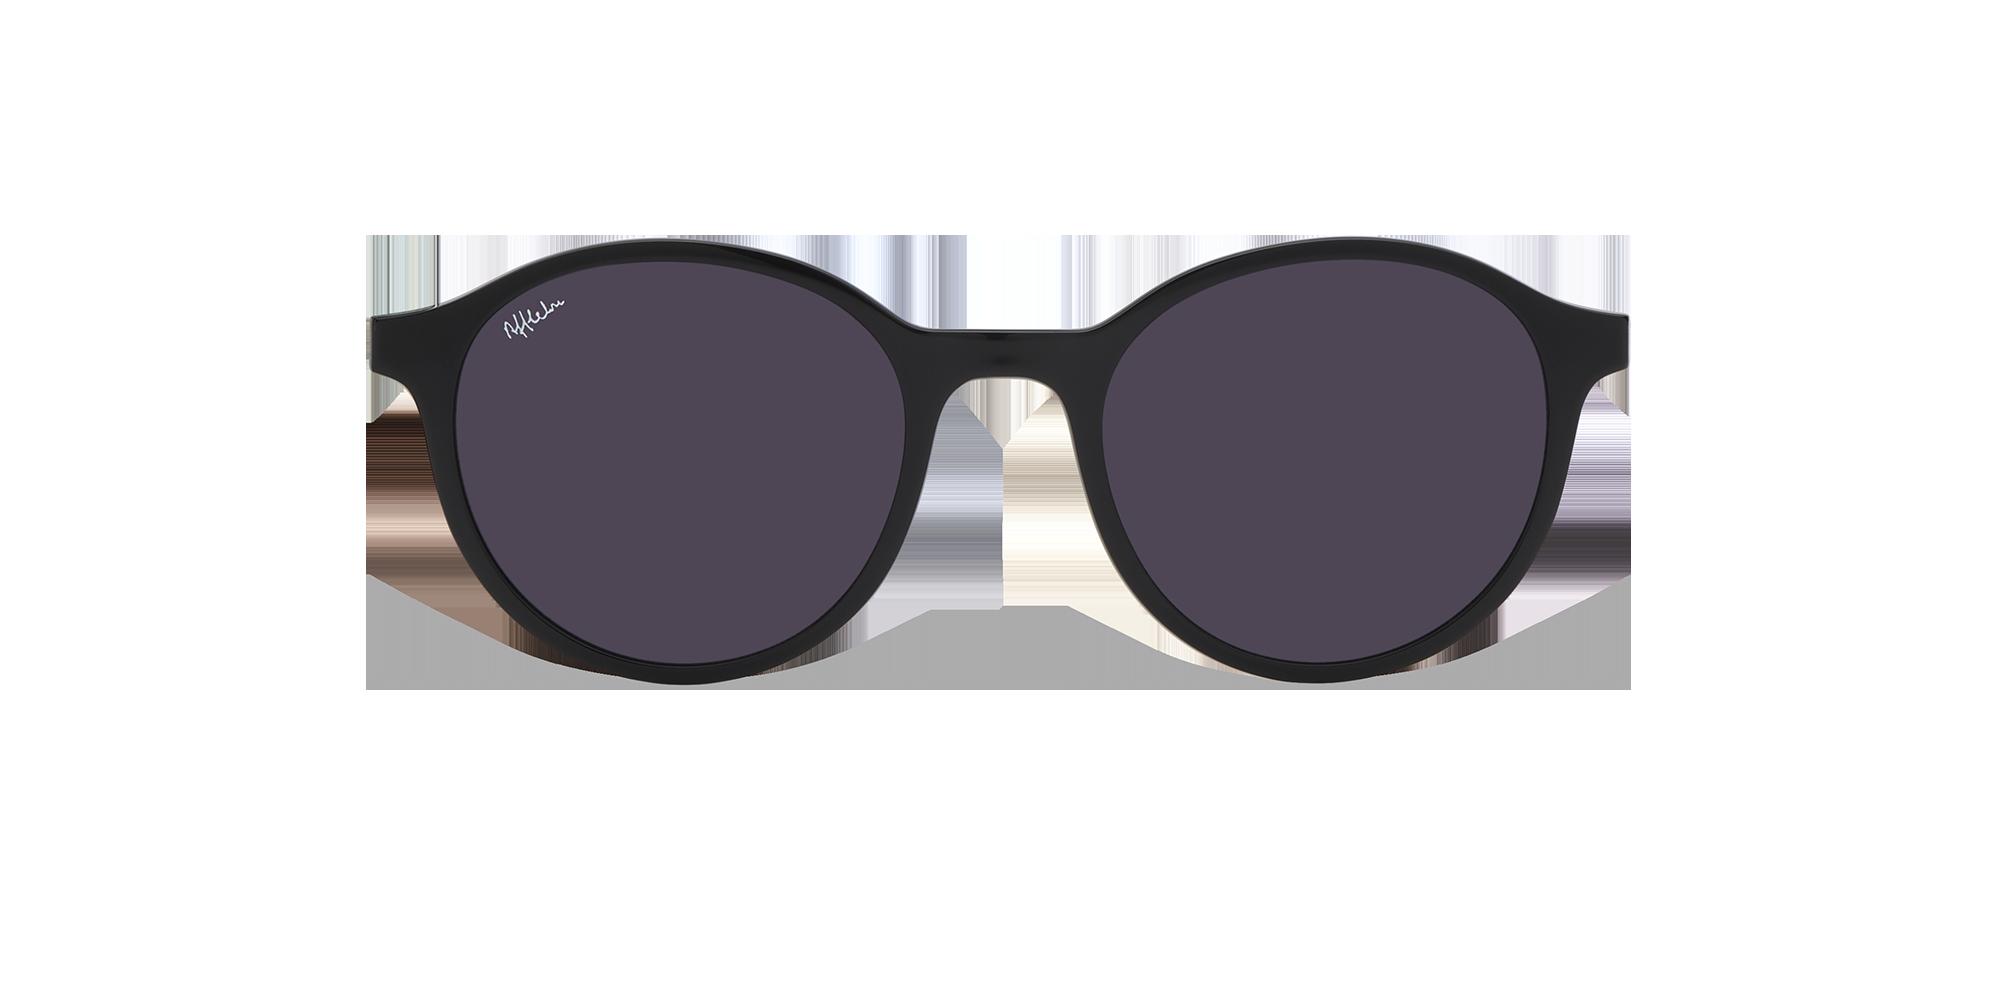 afflelou/france/products/smart_clip/clips_glasses/TMK37S4BK014919.png